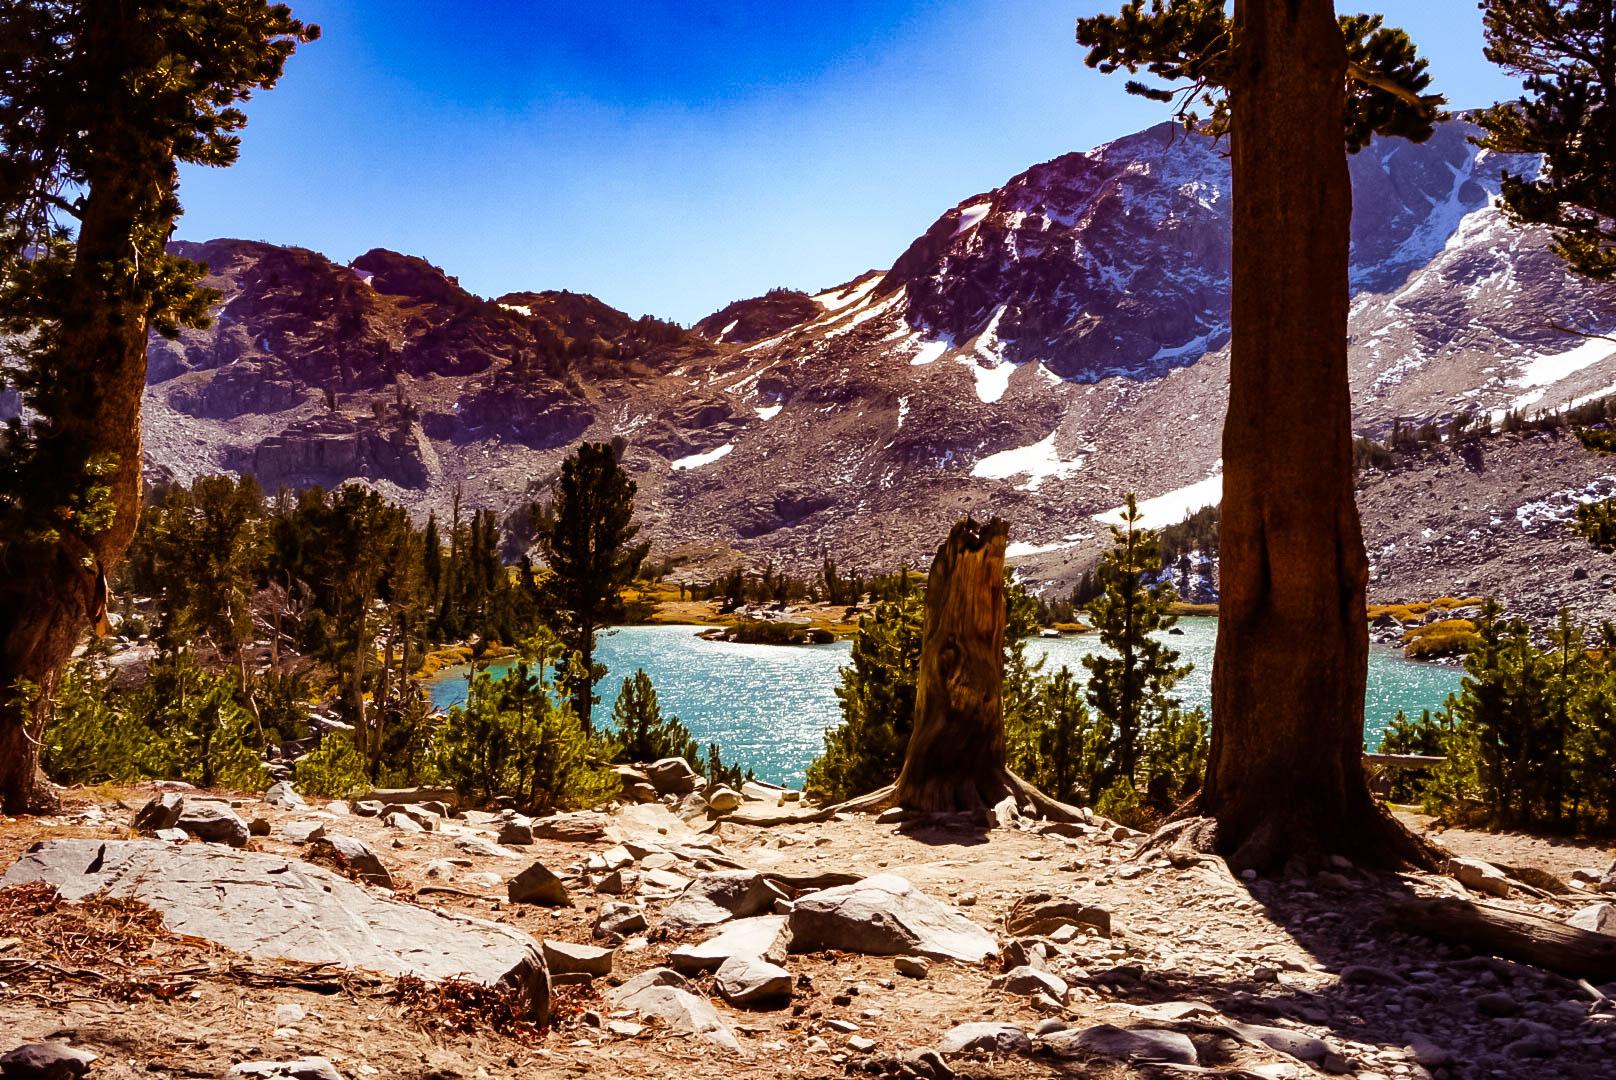 Yosemite National Park, California, Mammoth Lakes